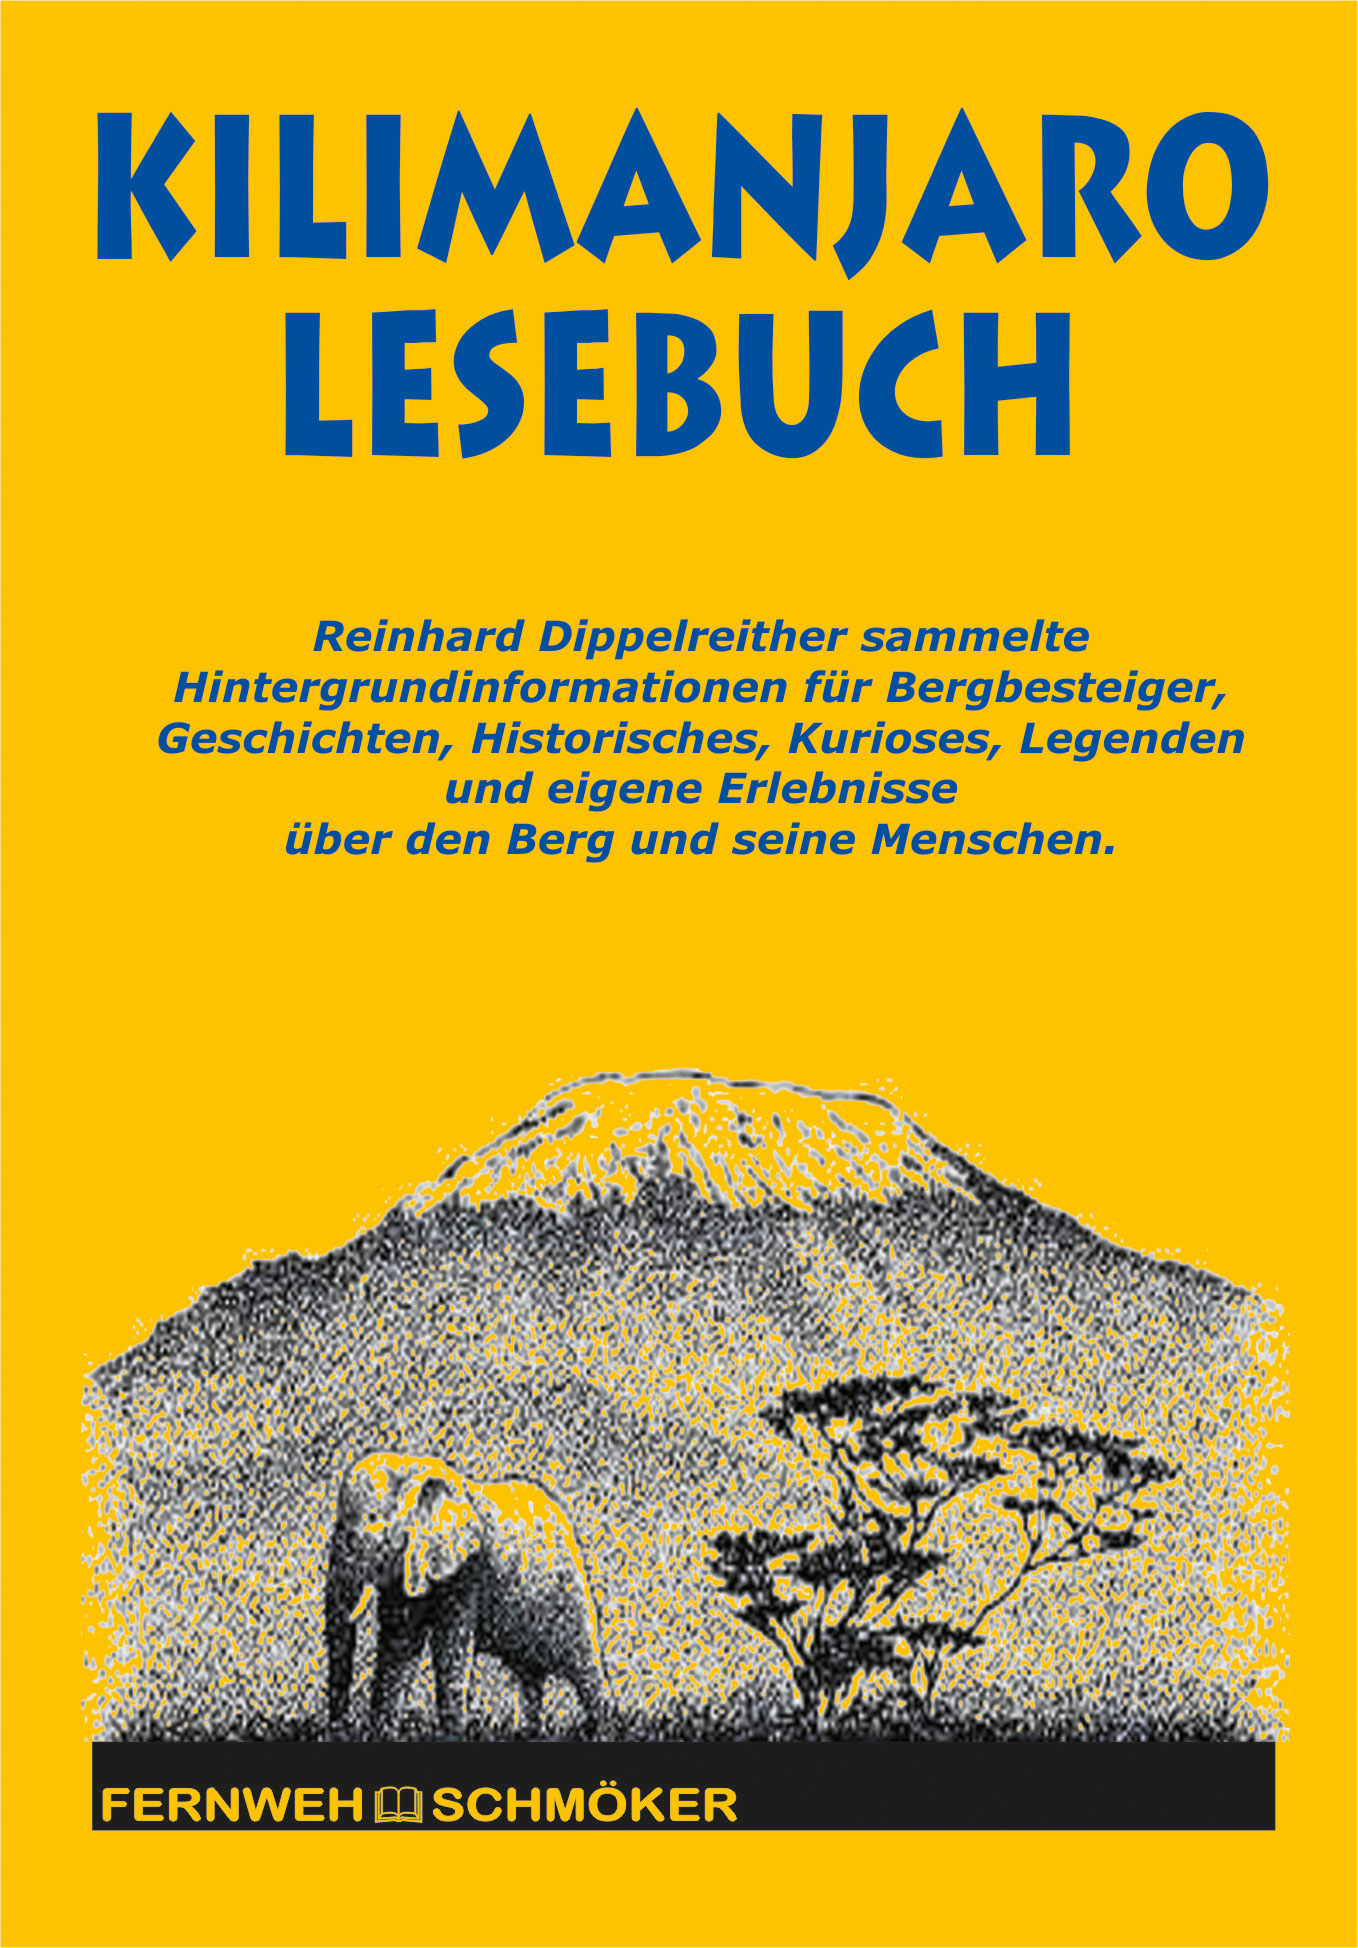 Kilimanjaro Lesebuch